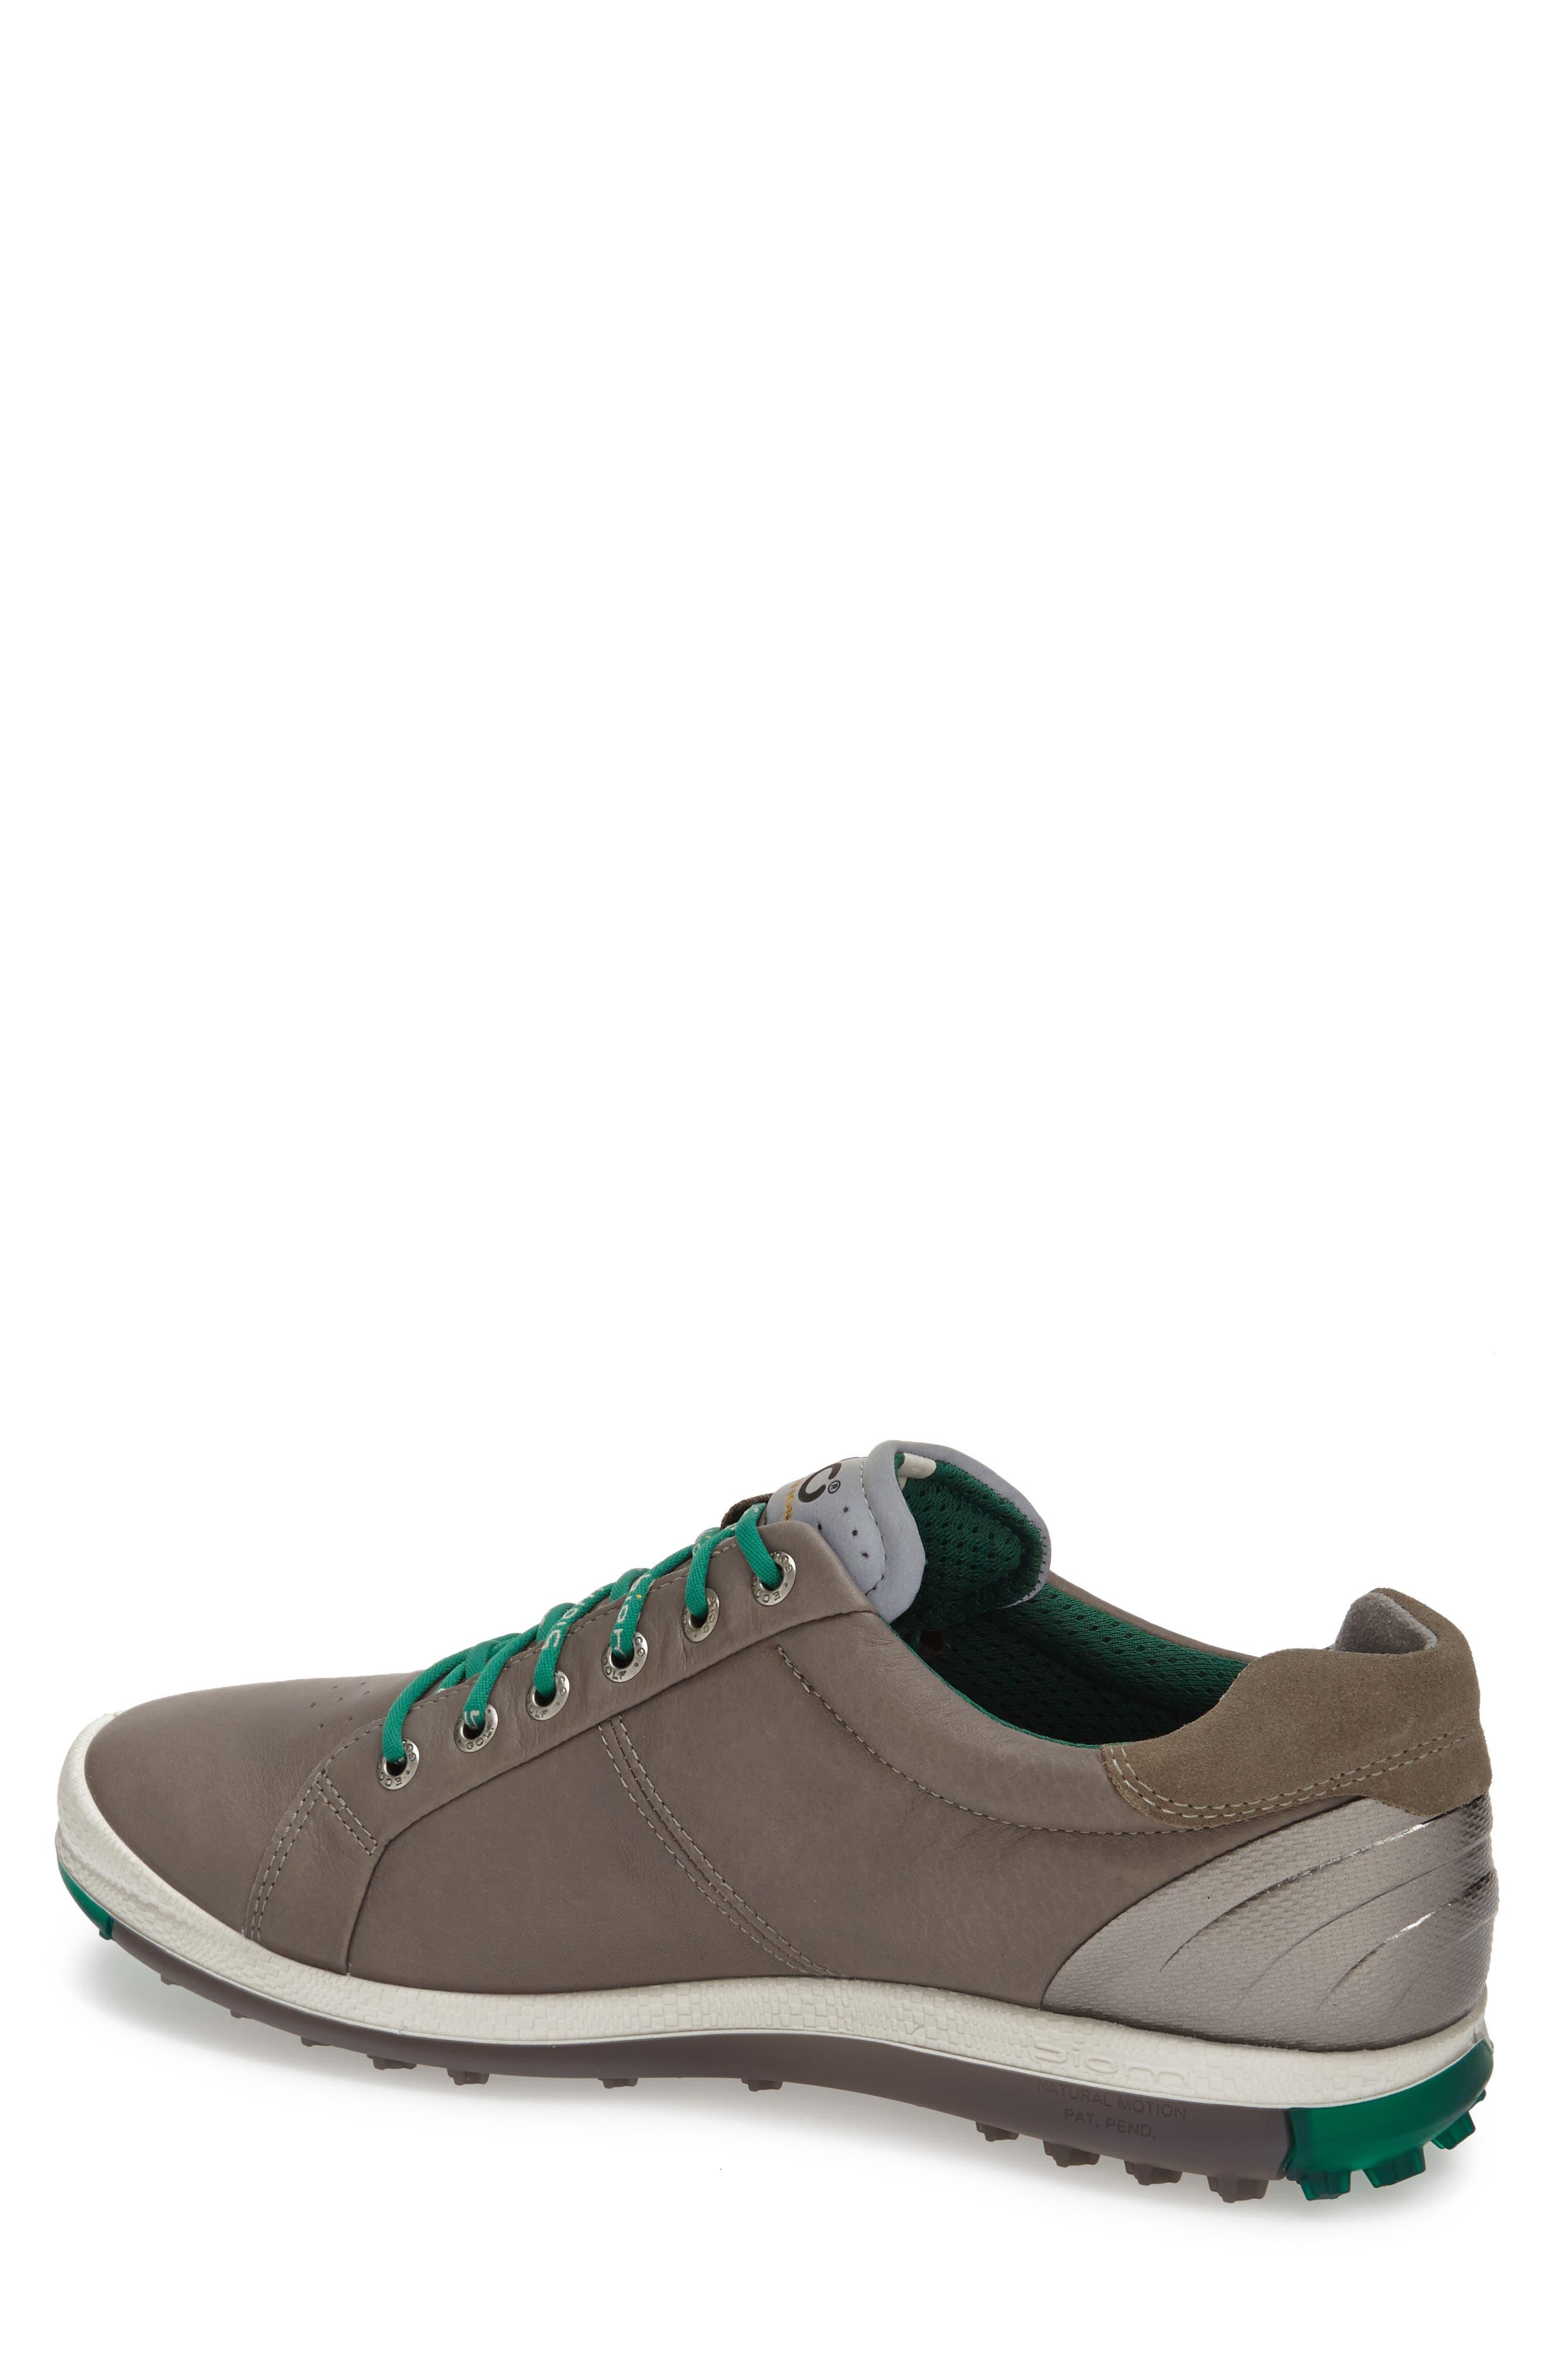 BIOM Hybrid 2 Golf Shoe,                             Alternate thumbnail 2, color,                             WARM GREY/ GREEN